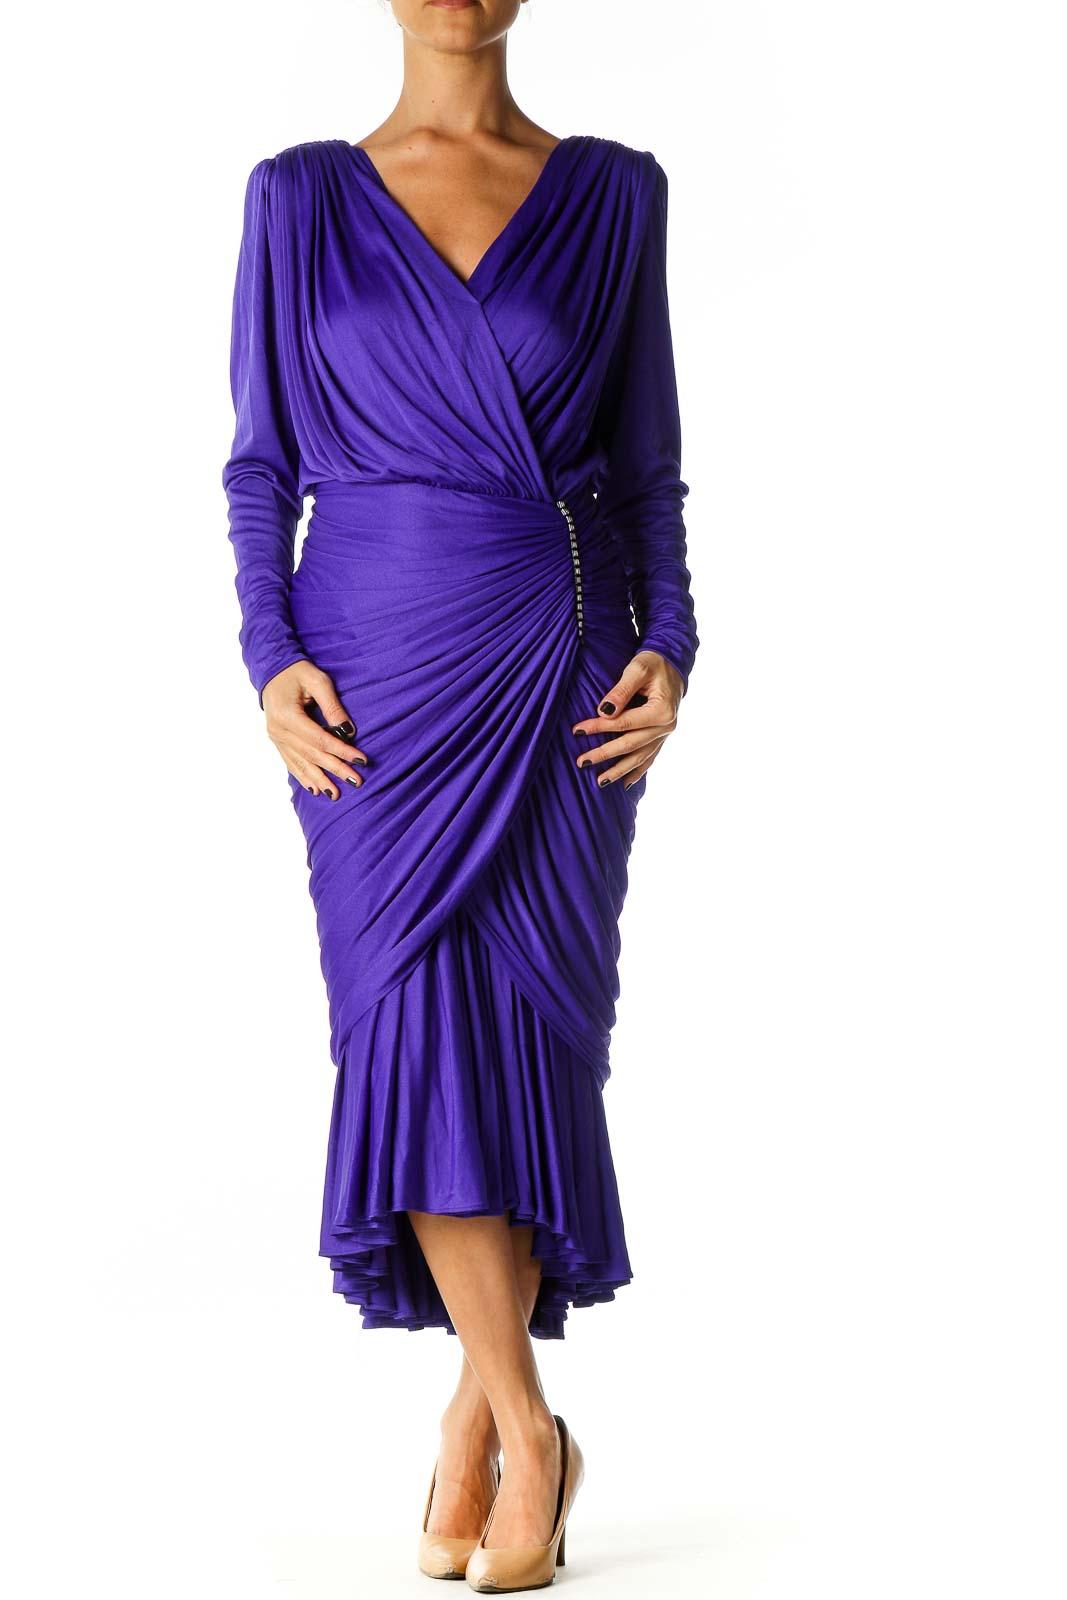 Purple Solid Column Dress Front